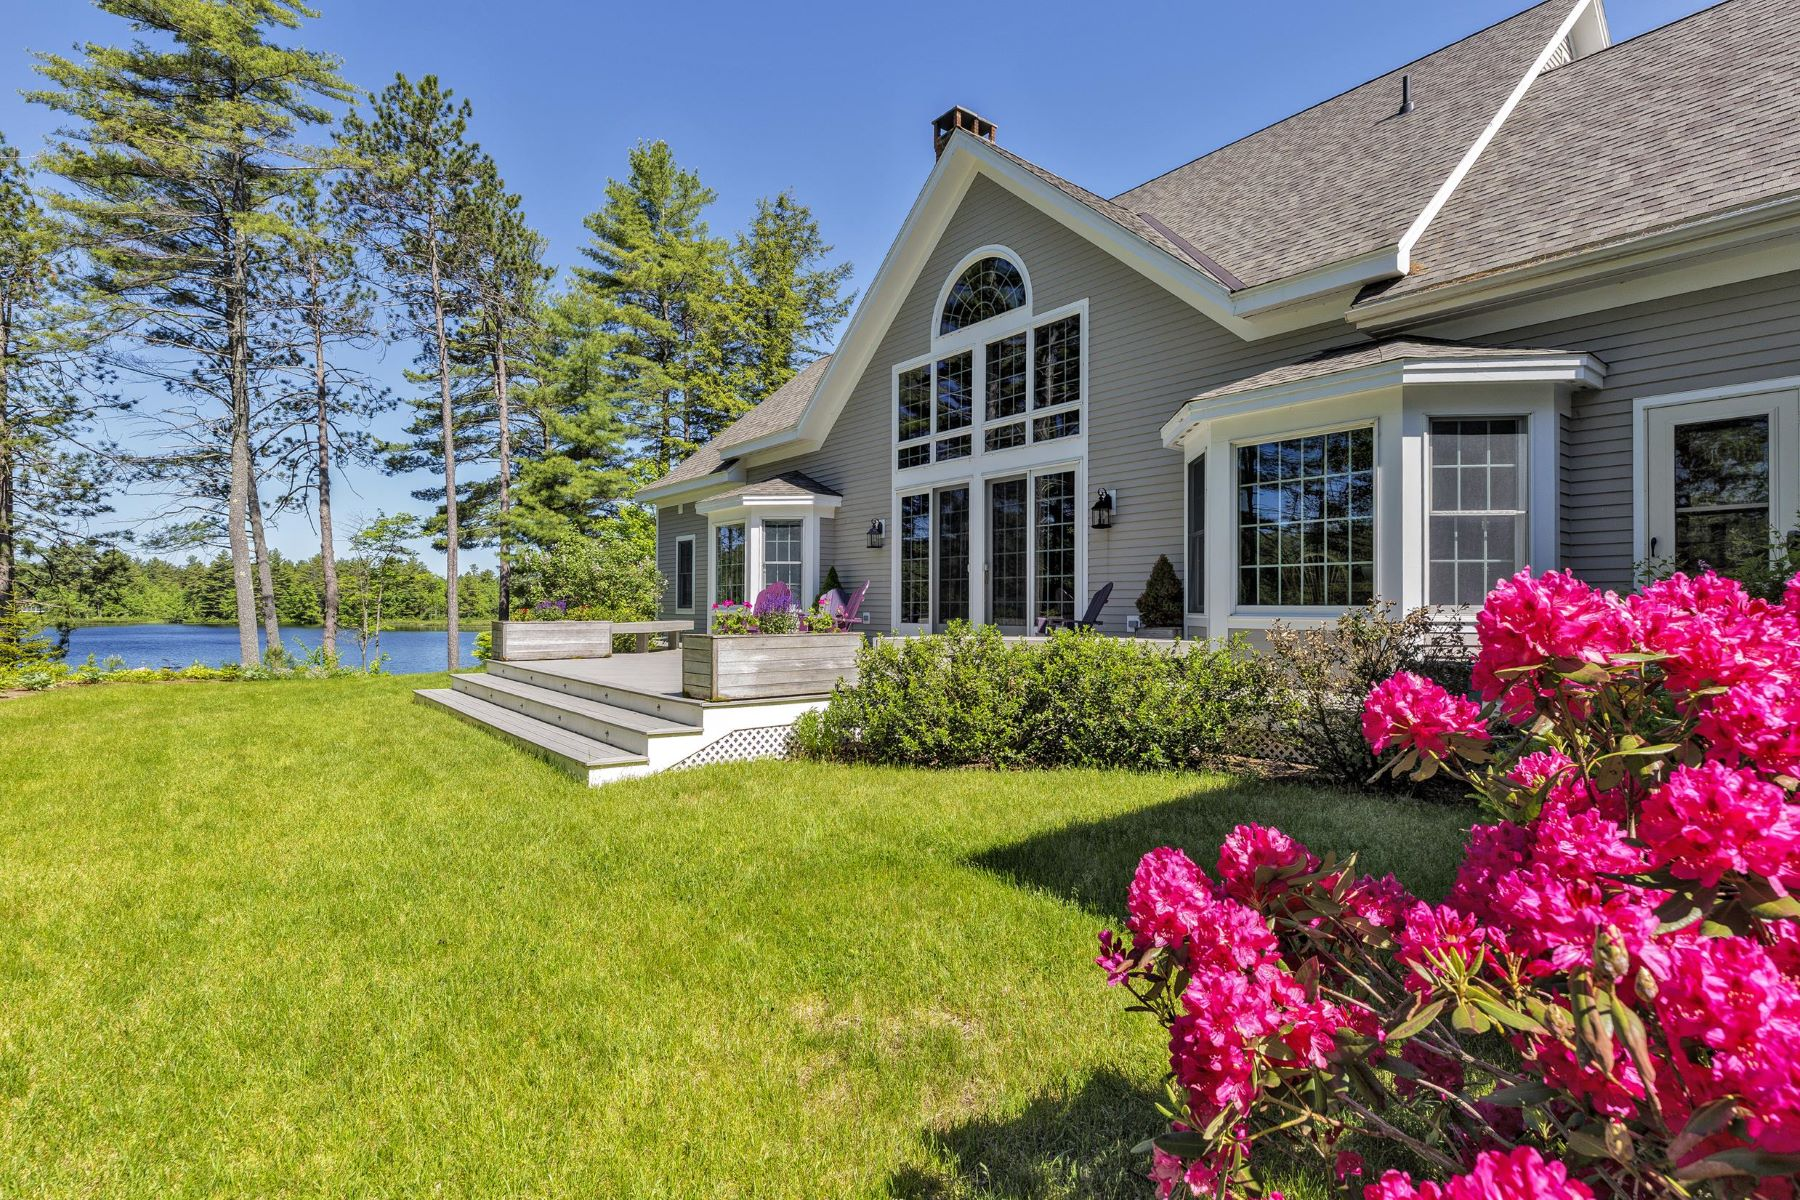 Single Family Homes 为 销售 在 Lovely Waterfont Home on Messer Pond 58 Little Cove Rd 新伦敦, 新罕布什尔州 03257 美国